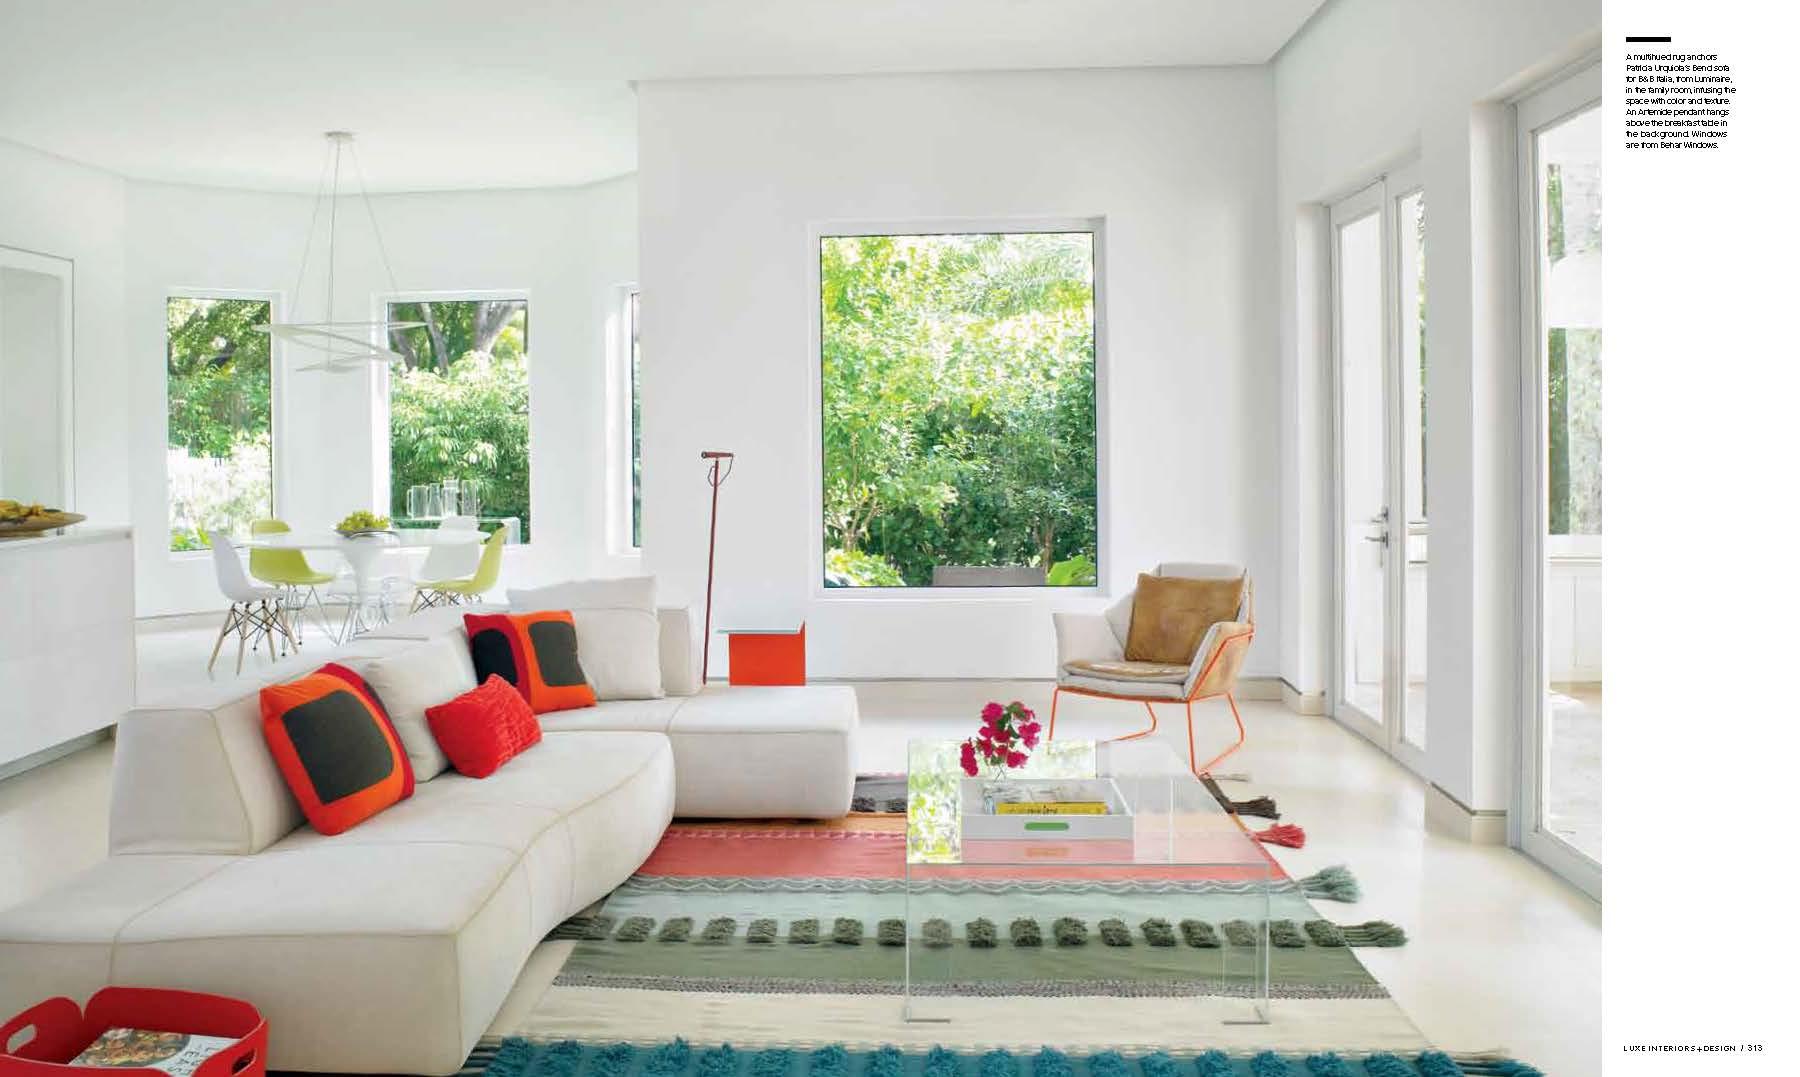 Luxe magazine features dkor 2015 interior design press for Luxe interieur design